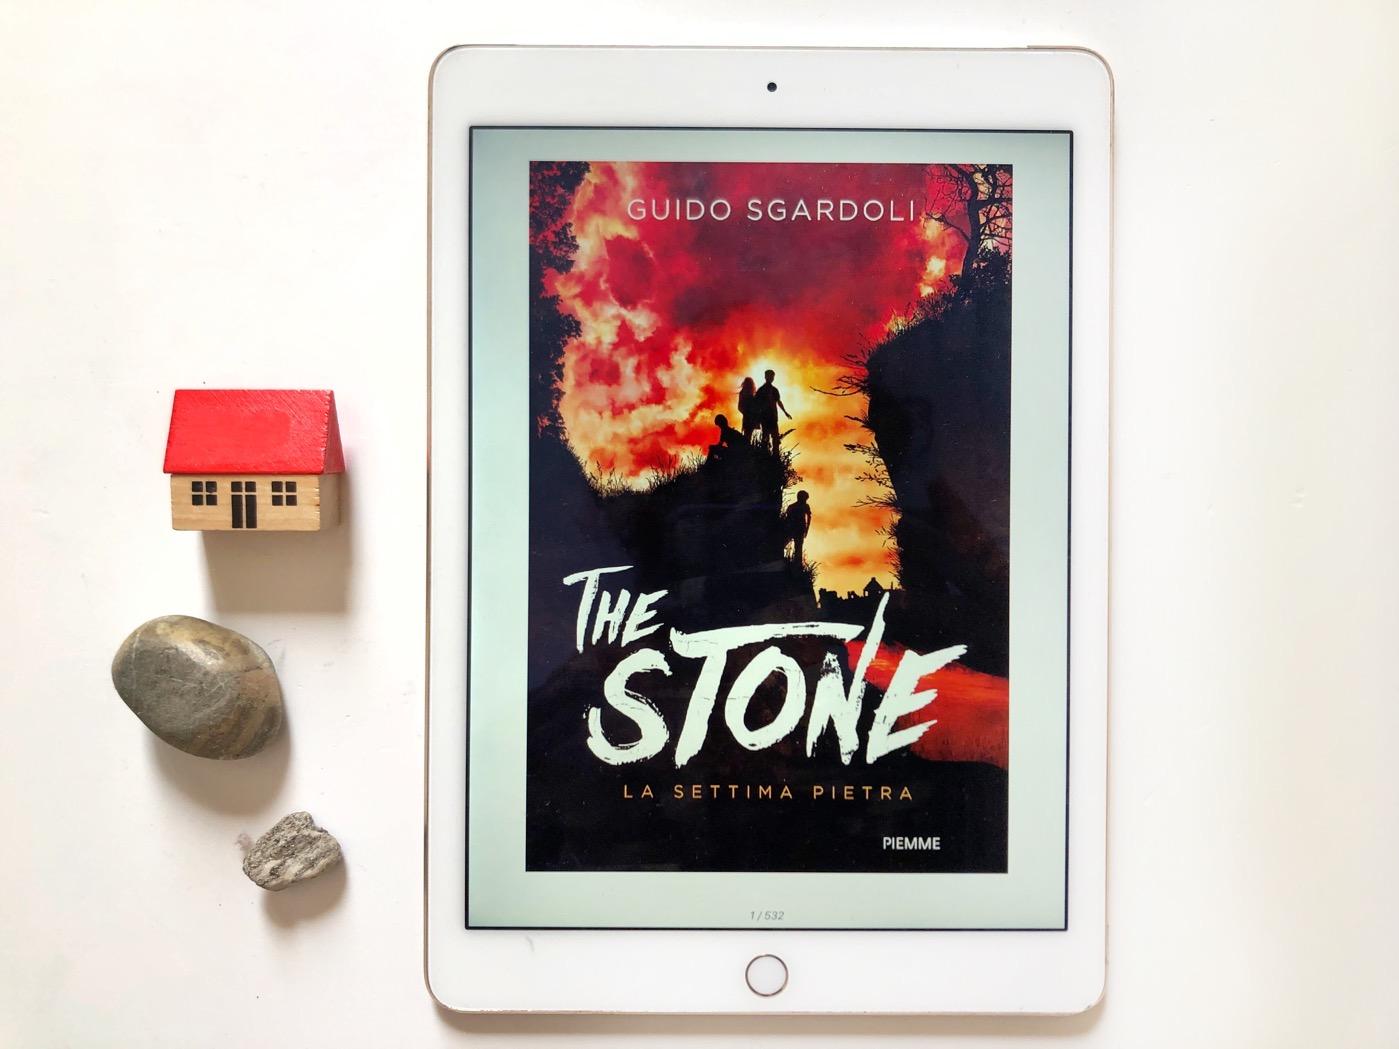 the-stone-guido-sgardoli-piemme